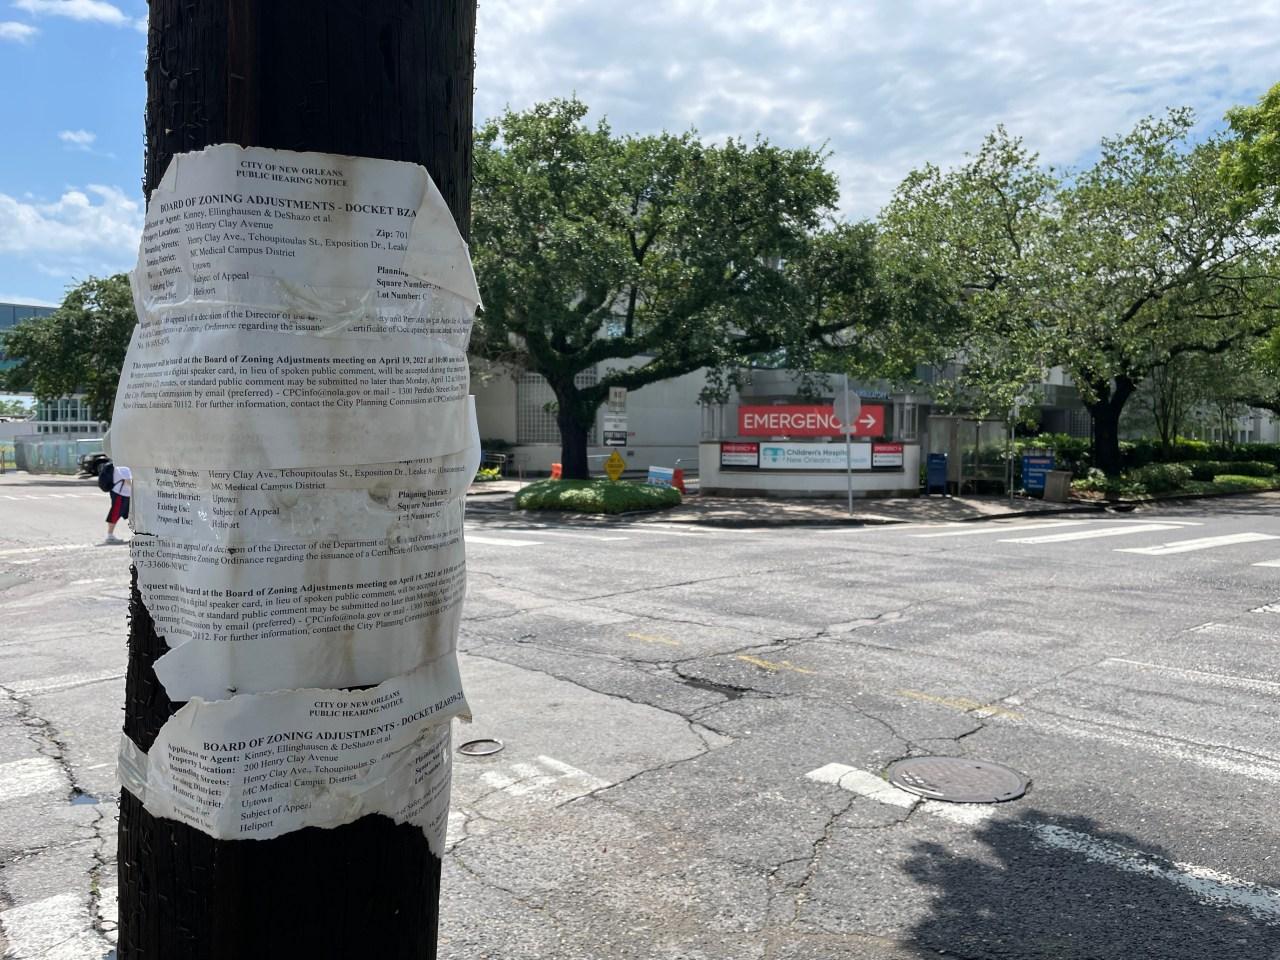 Residents speak out following lawsuit against Children's Hospital